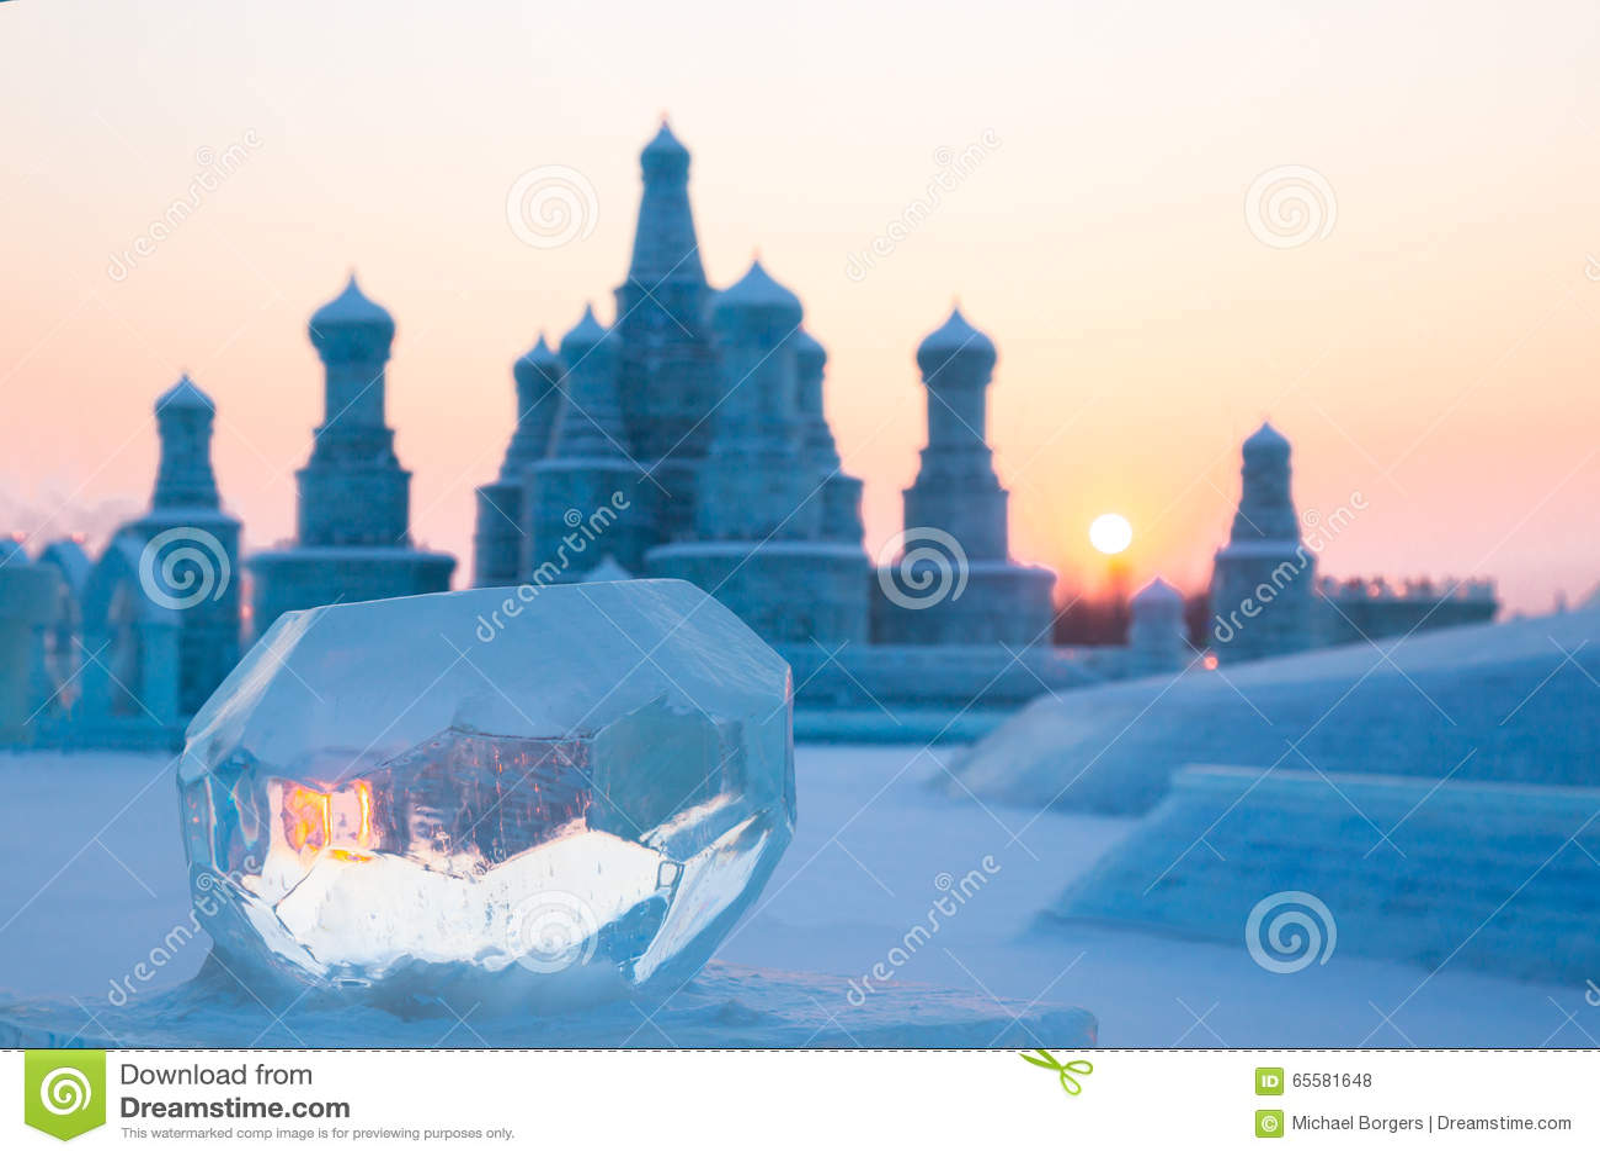 Bola de gelo no por do sol no inverno